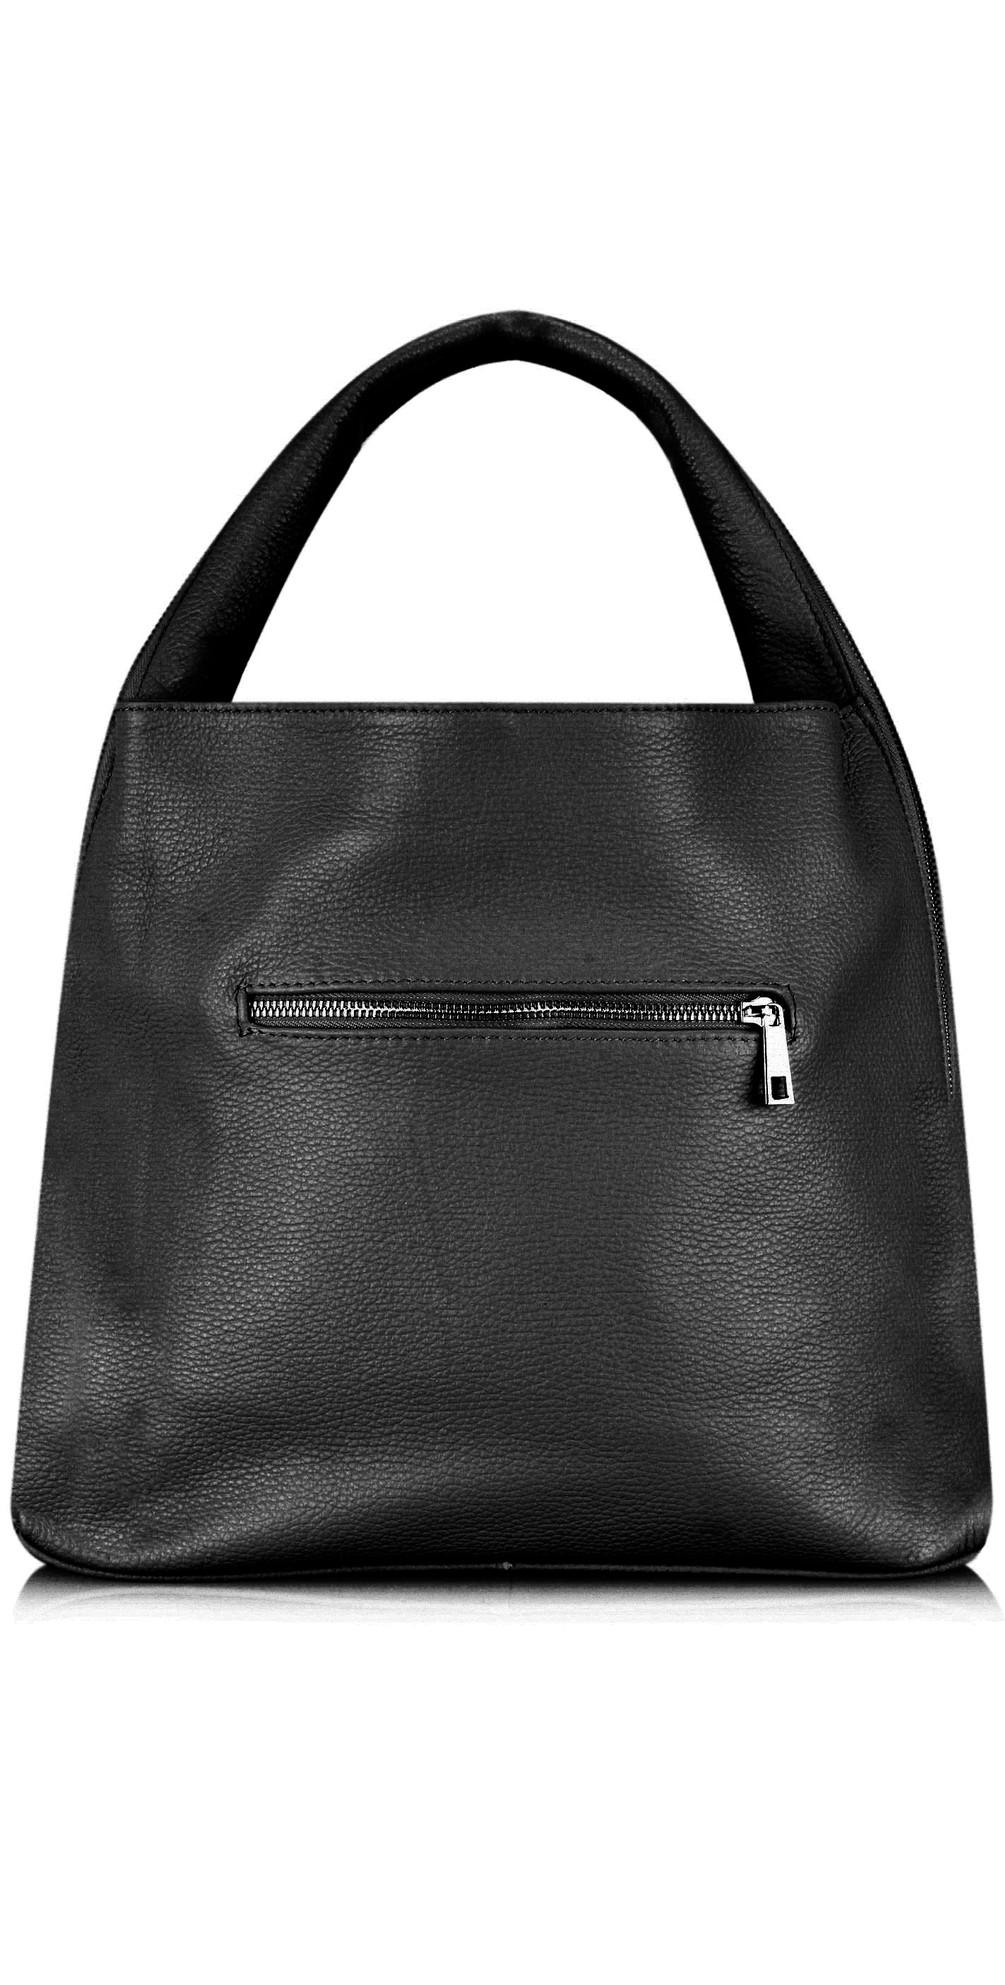 Ravenna Leather Bag main image